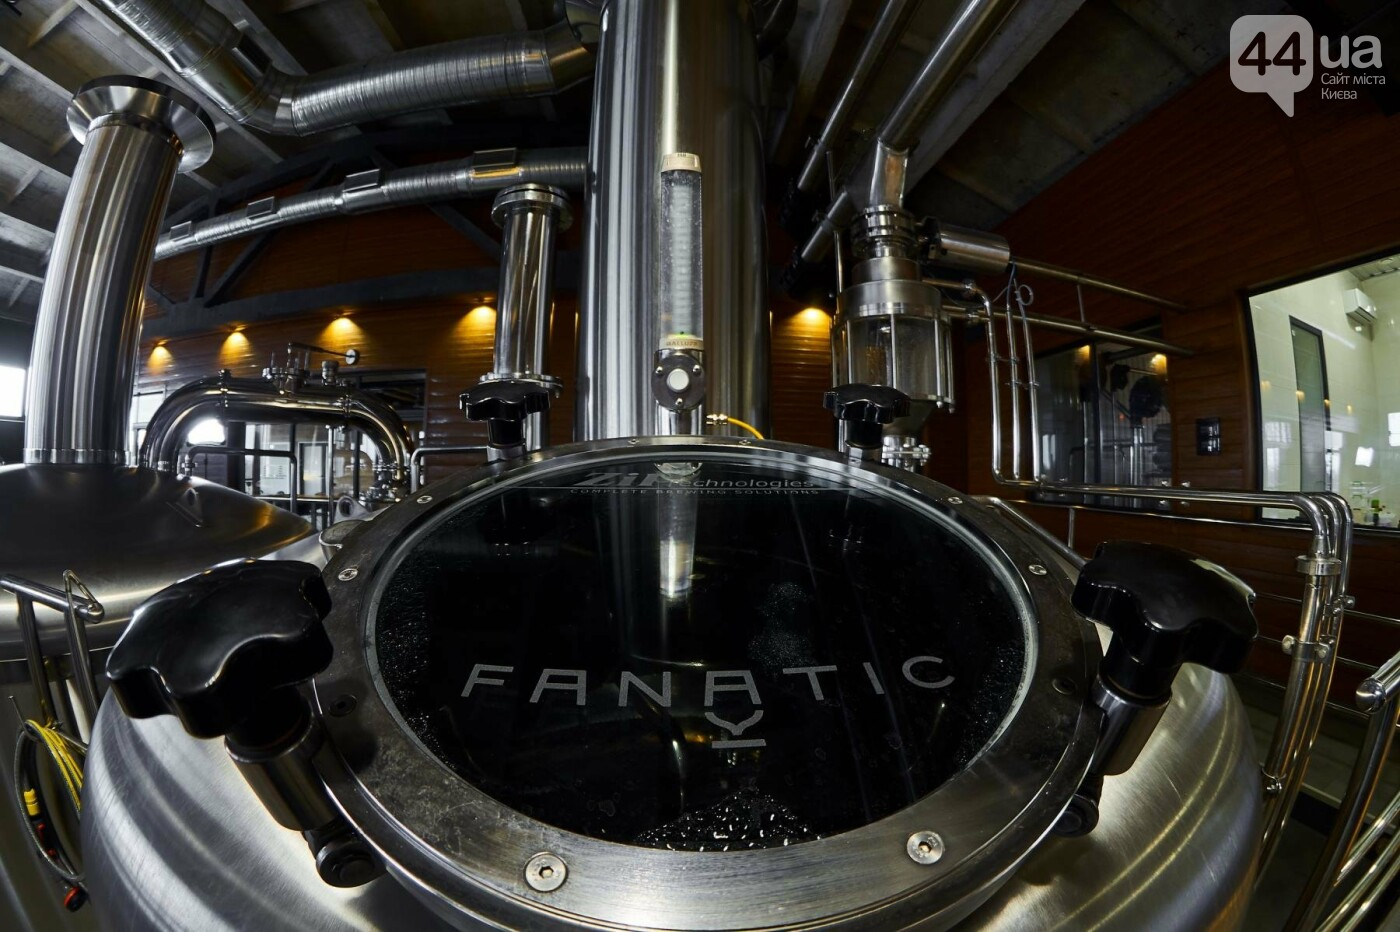 Fanatic – территория пива, для пива и вокруг пива!, фото-13